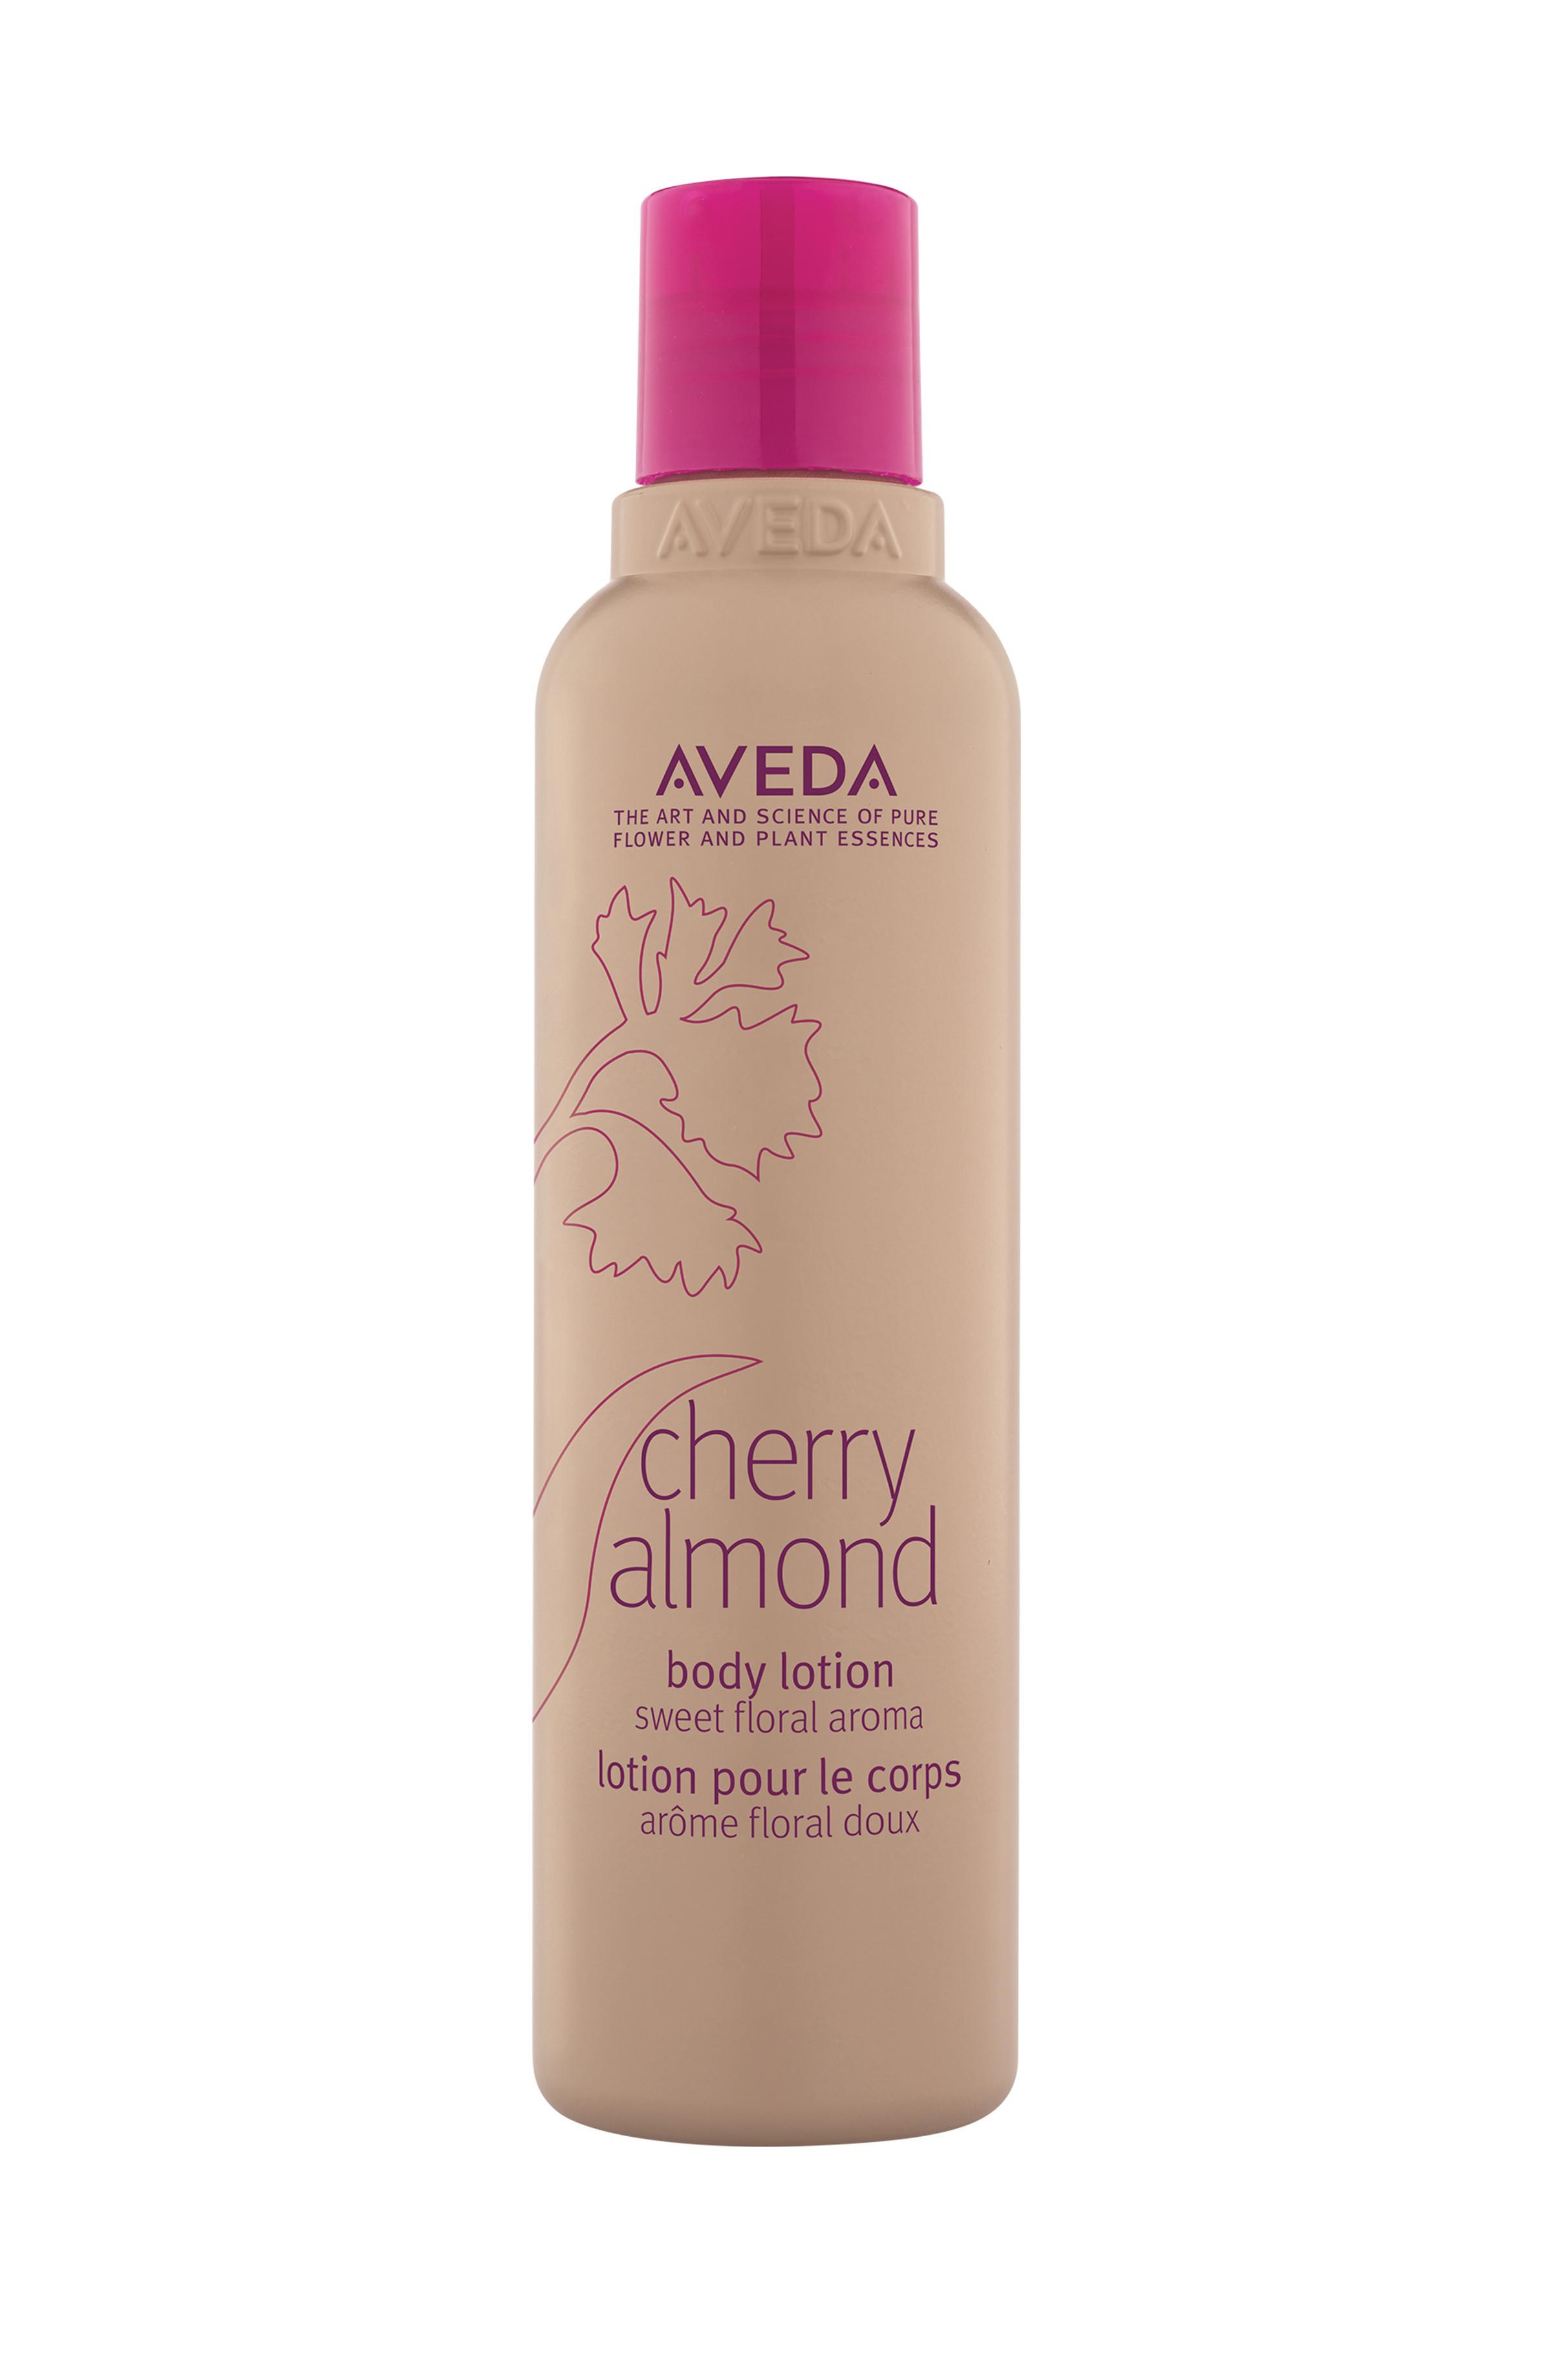 Aveda cherry almond lozione corpo 200 ml, Beige, large image number 0